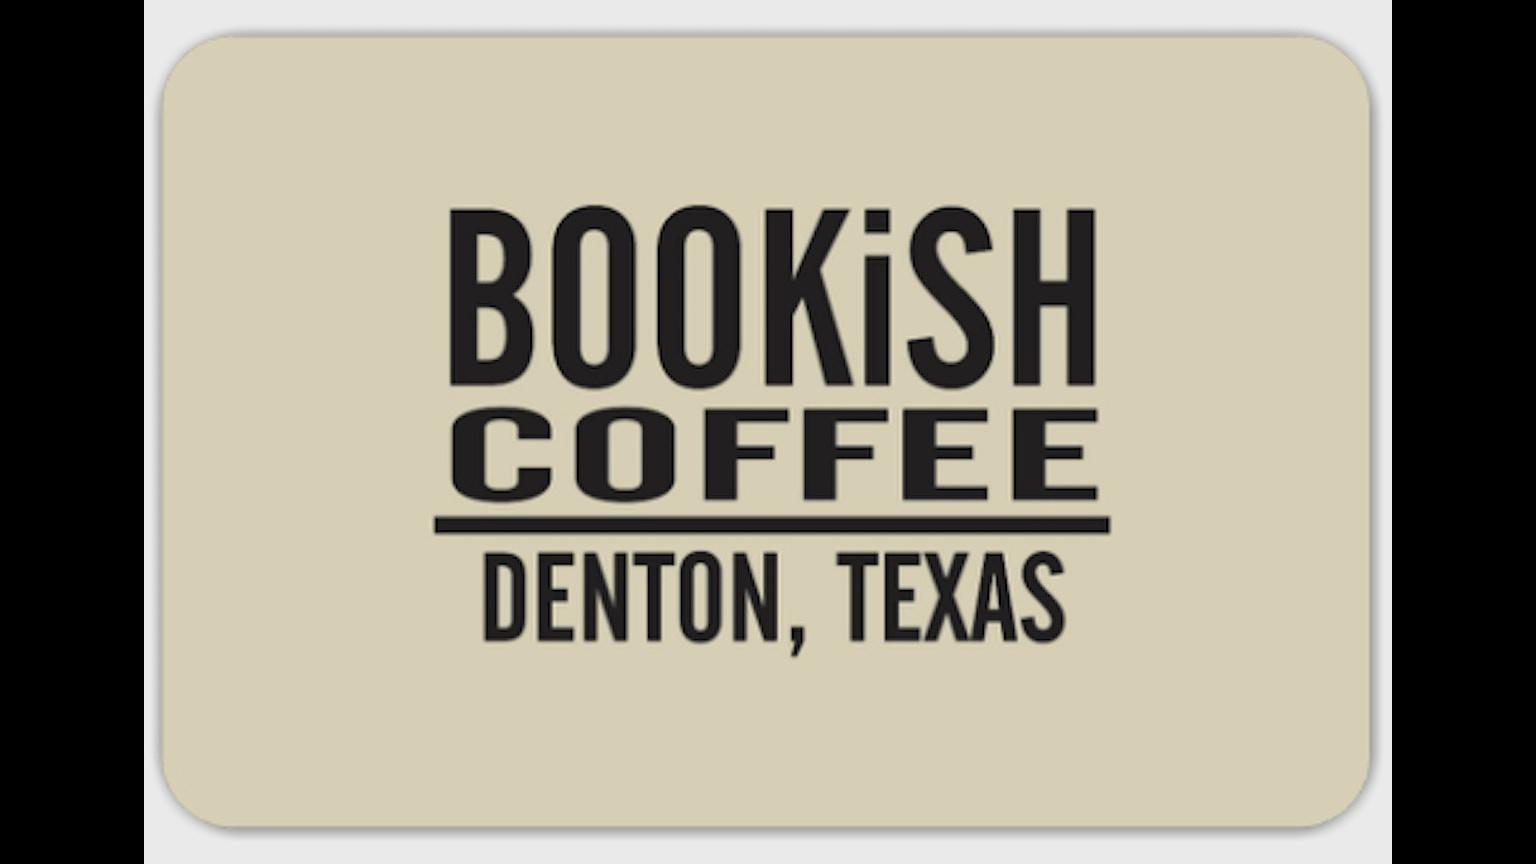 Bookish Coffee Coffee Roasting In Denton Texas By Clay